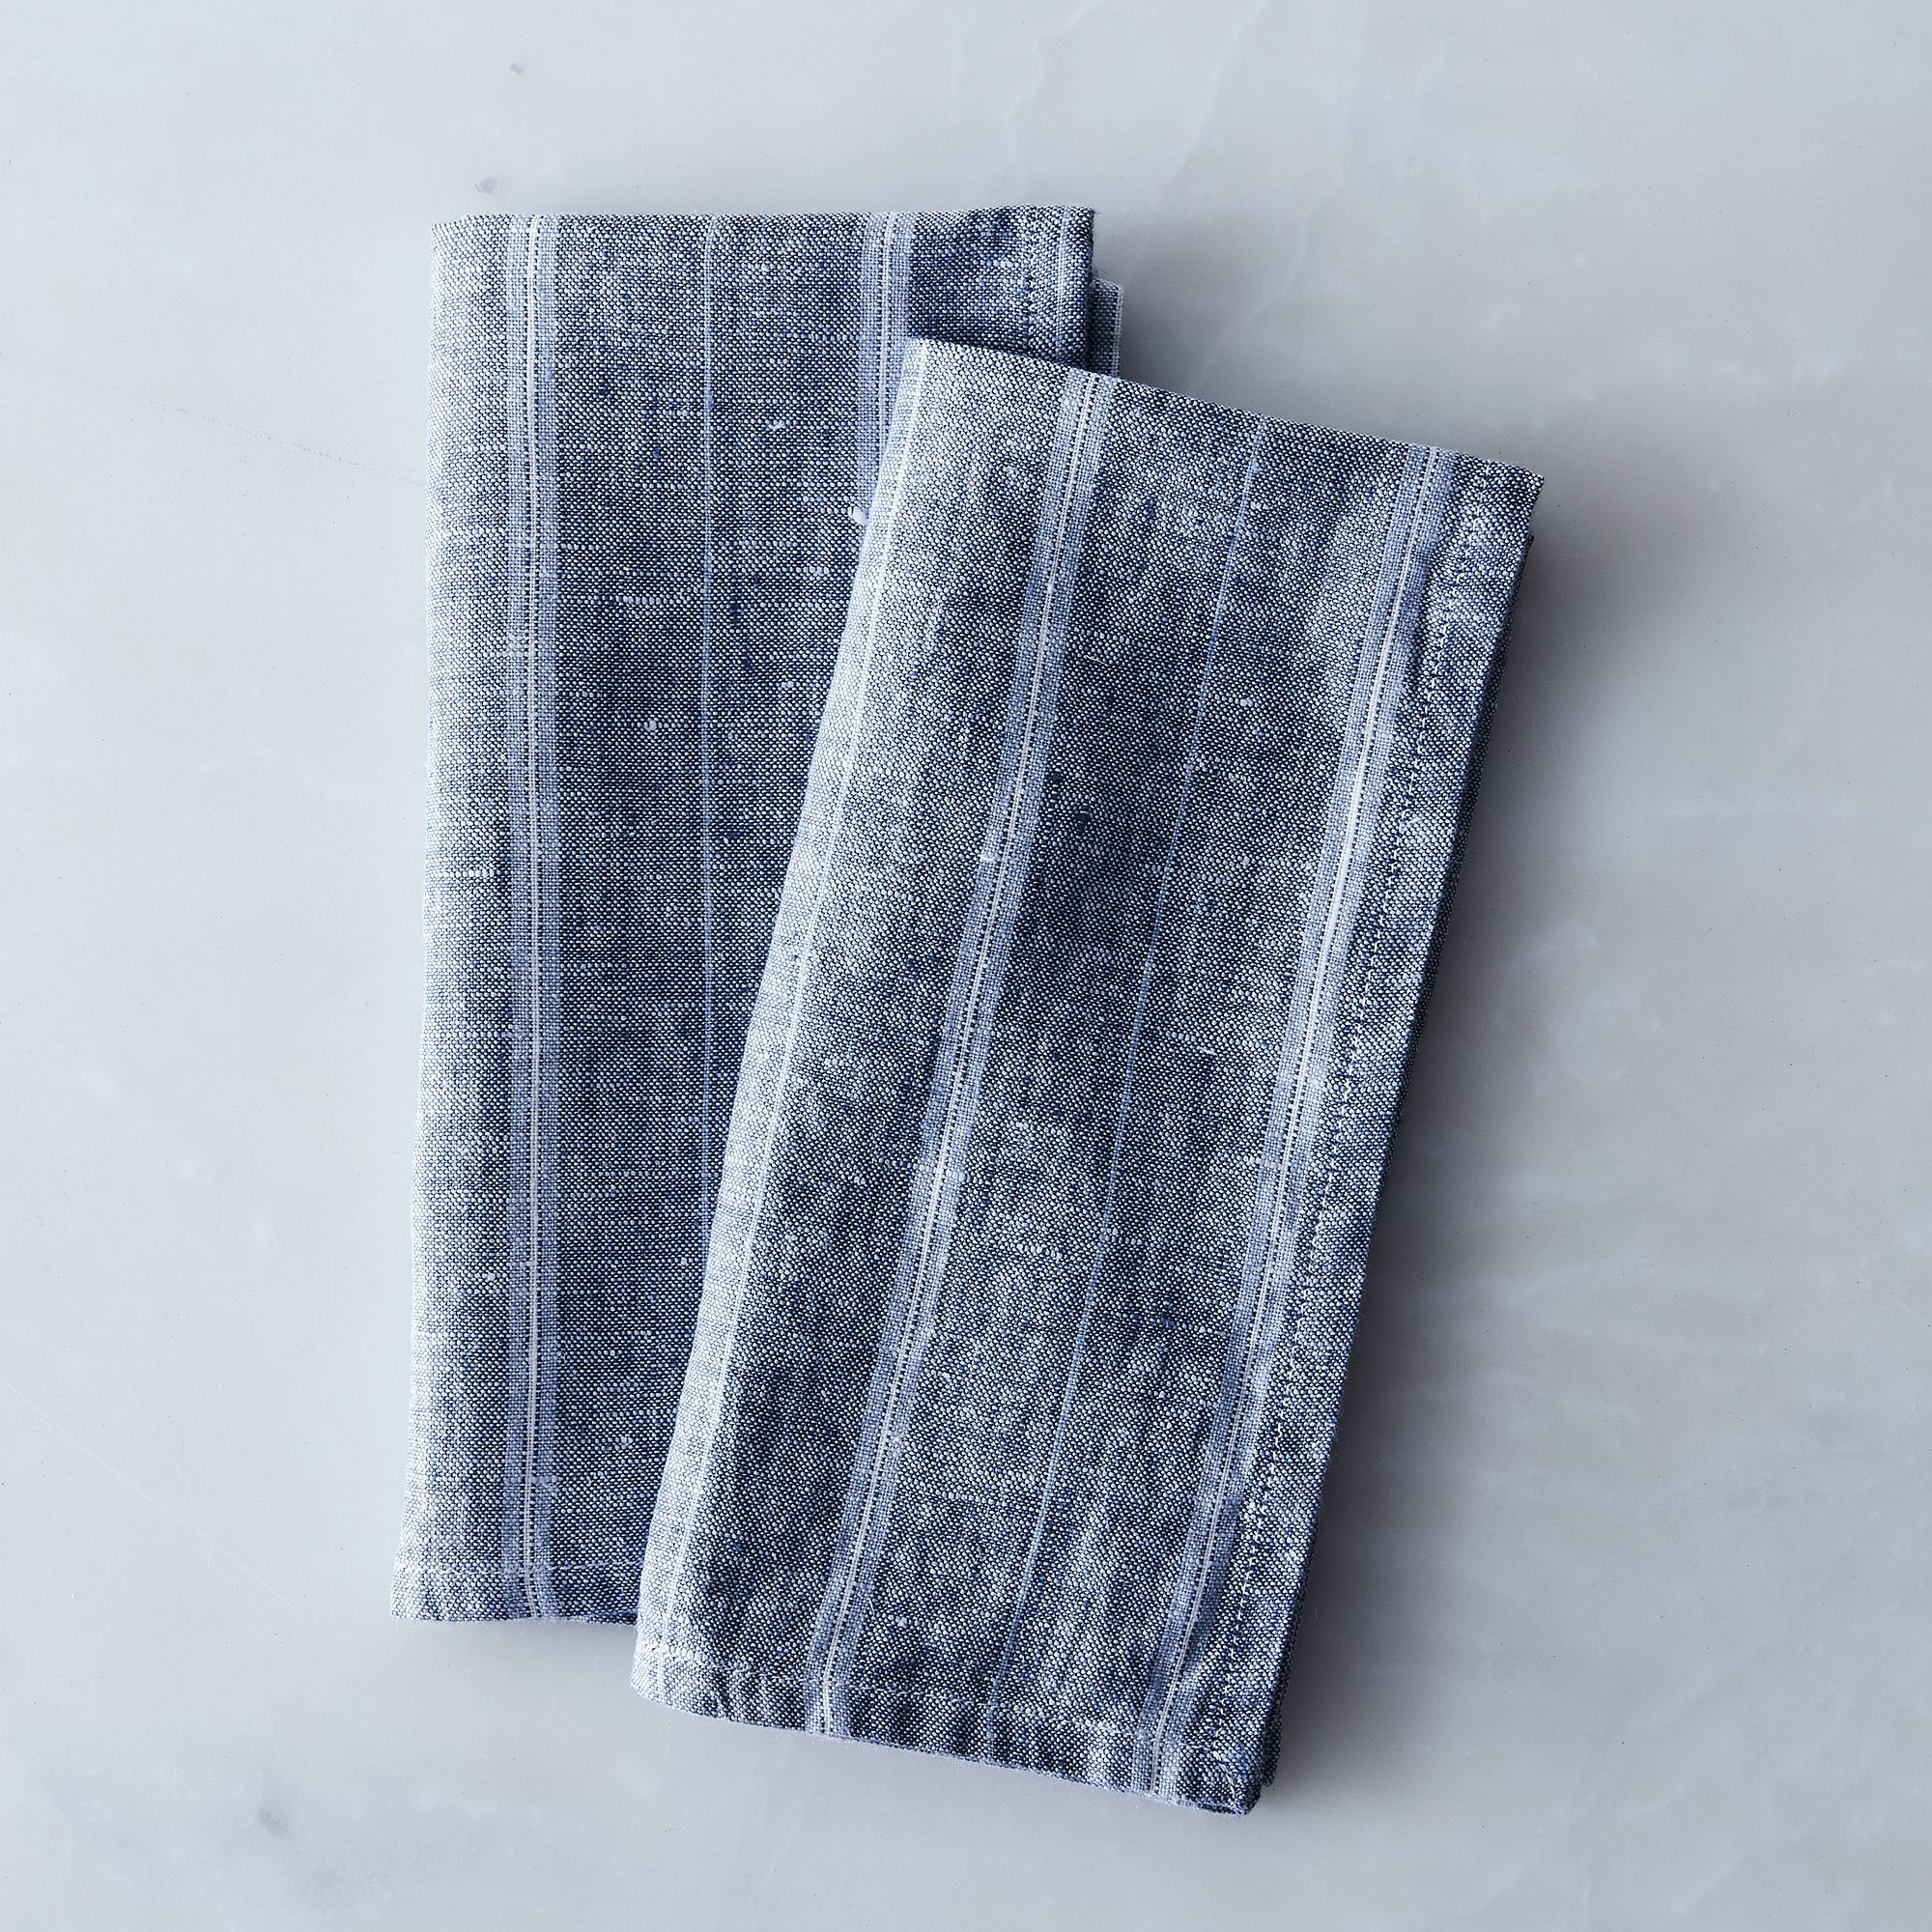 E4005e2b bd09 49e0 b47f c88c2a97bf7b  2017 0505 celina mancurti chambray stripe napkins set of 2 silo rocky luten 006